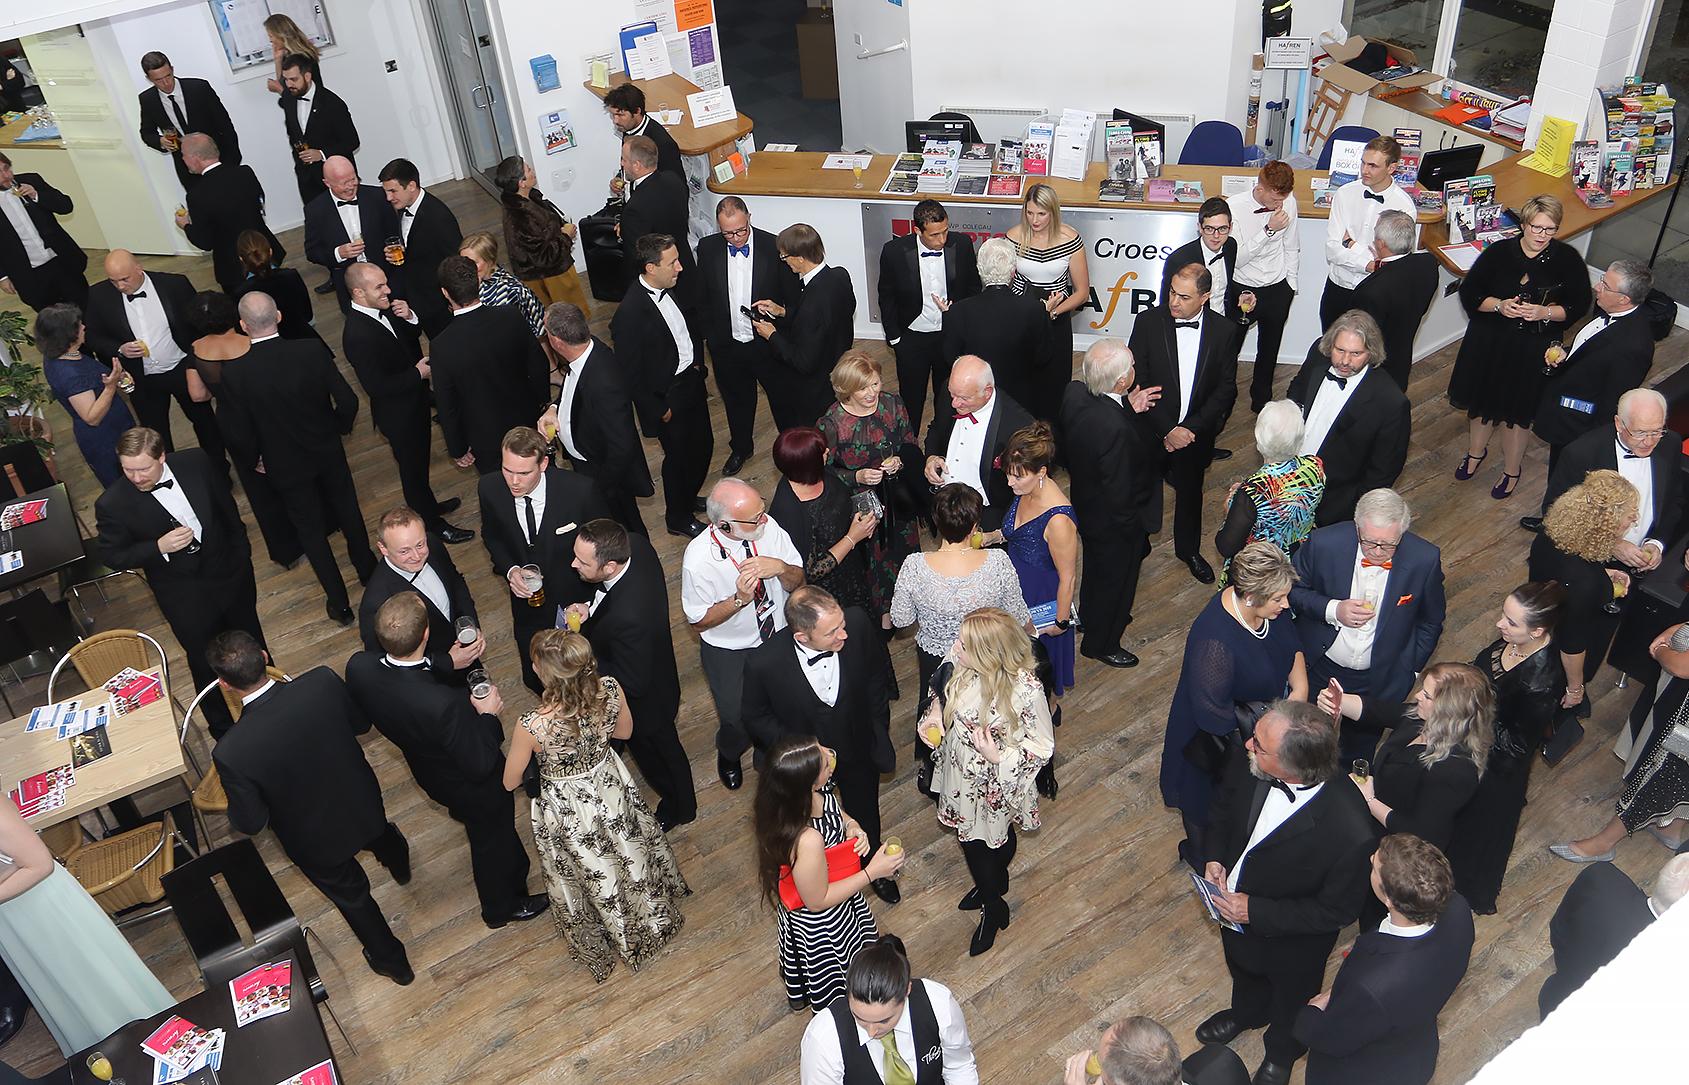 The 2018 Powys Business Awards